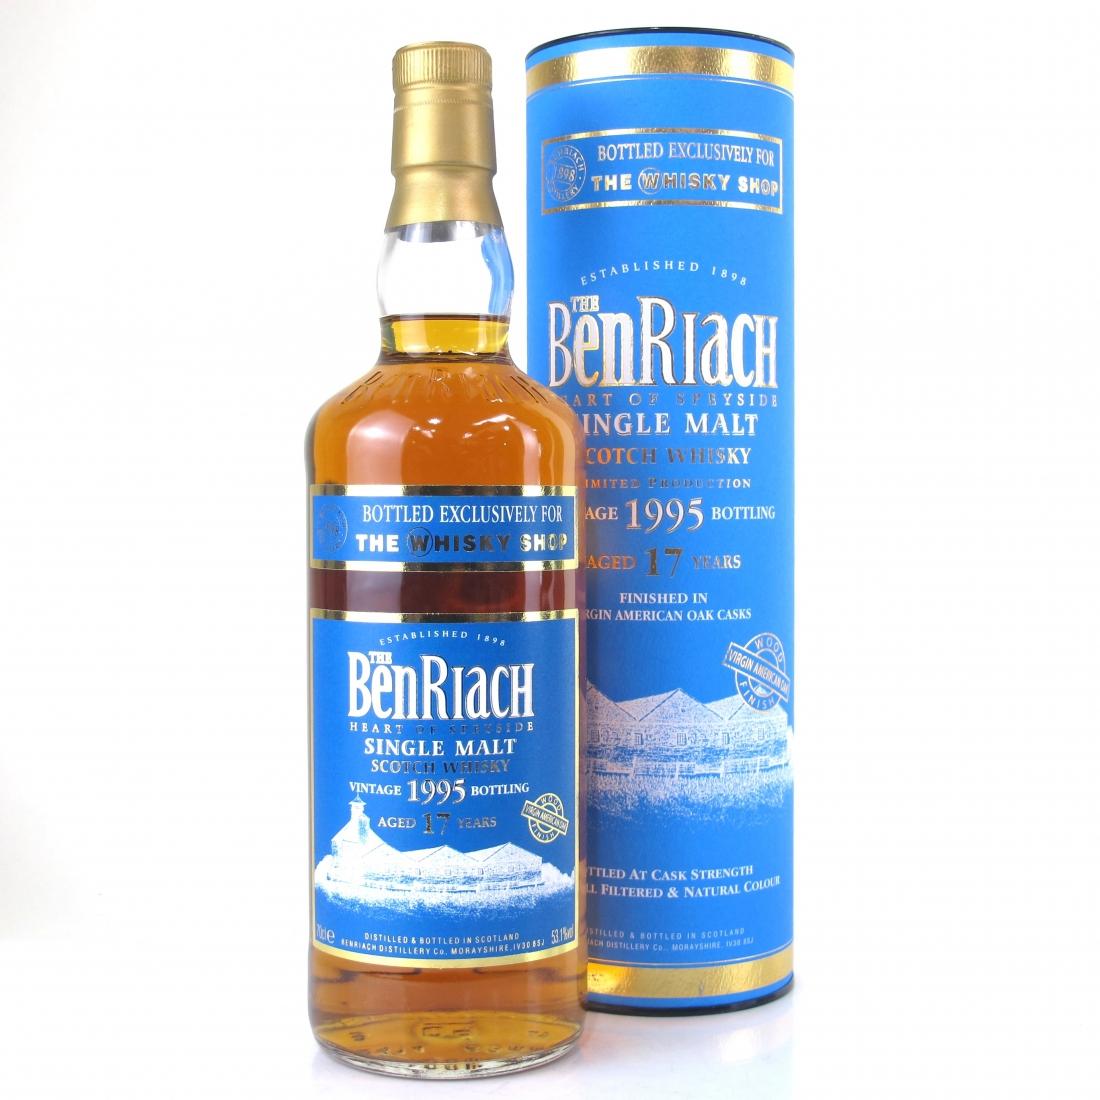 Benriach 1995 Virgin American Oak Finish 17 Year Old / Whisky Shop